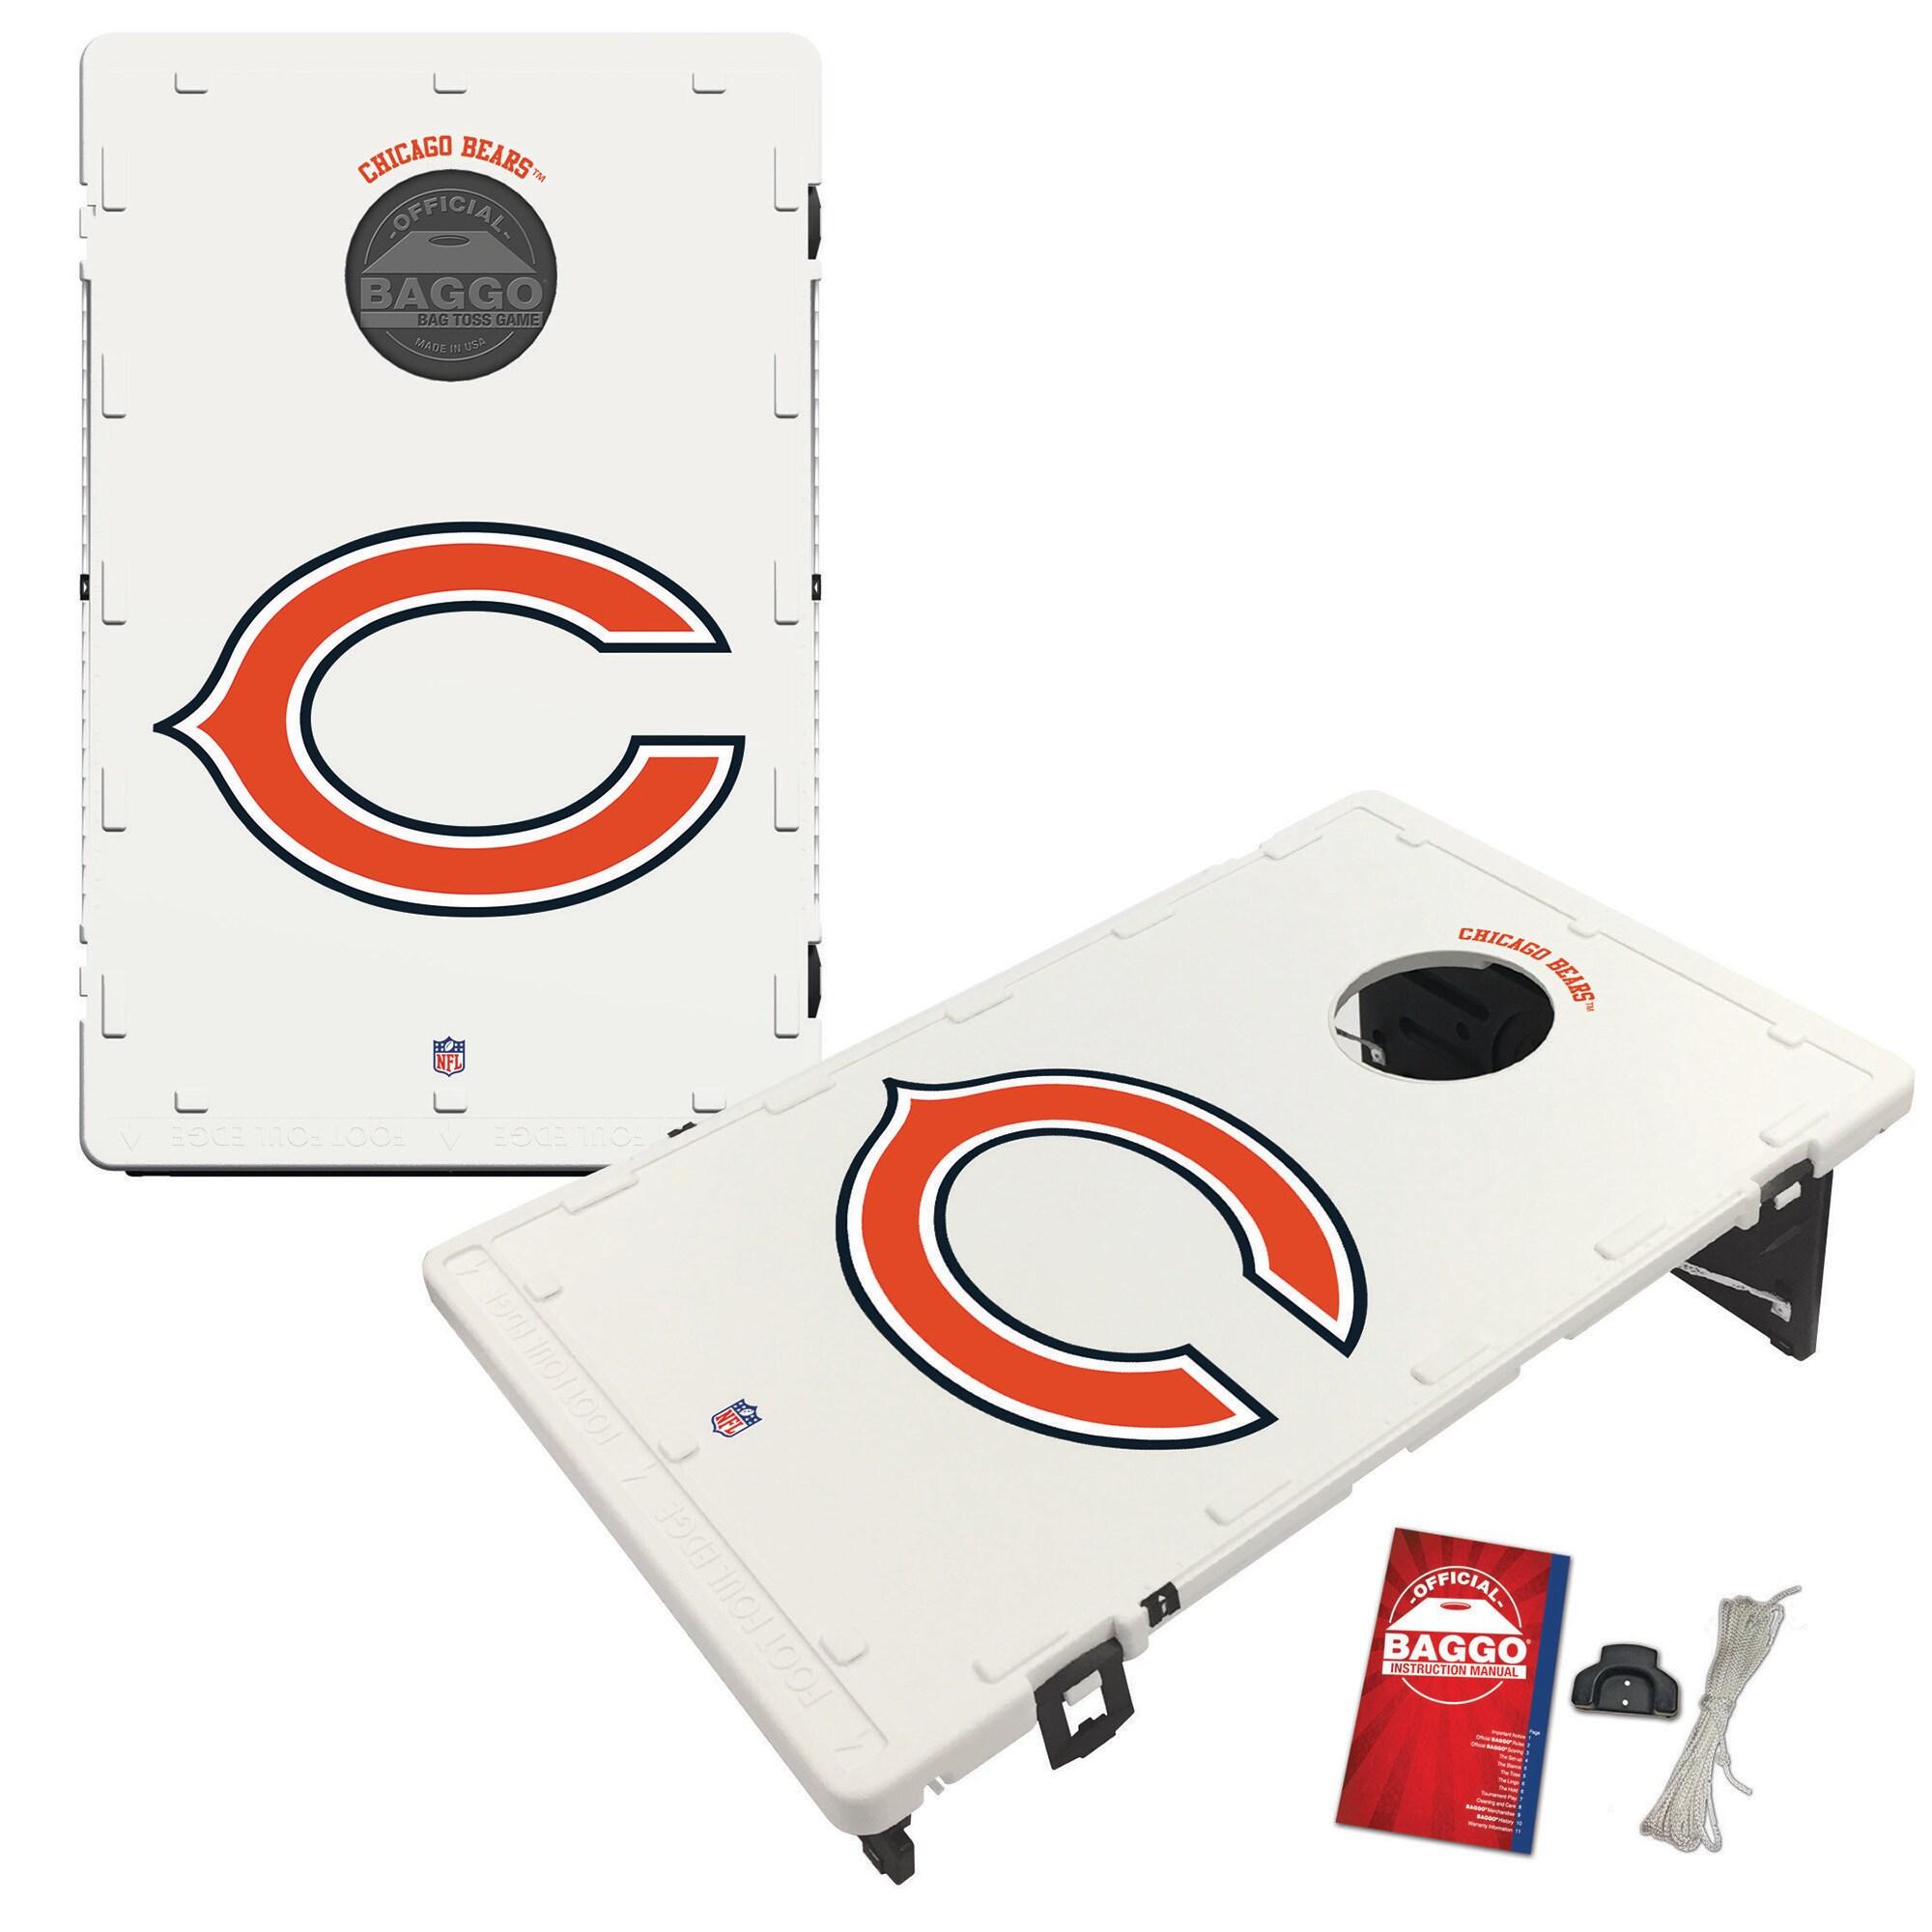 Chicago Bears 2' x 3' Classic Design BAGGO Cornhole Board Tailgate Toss Set